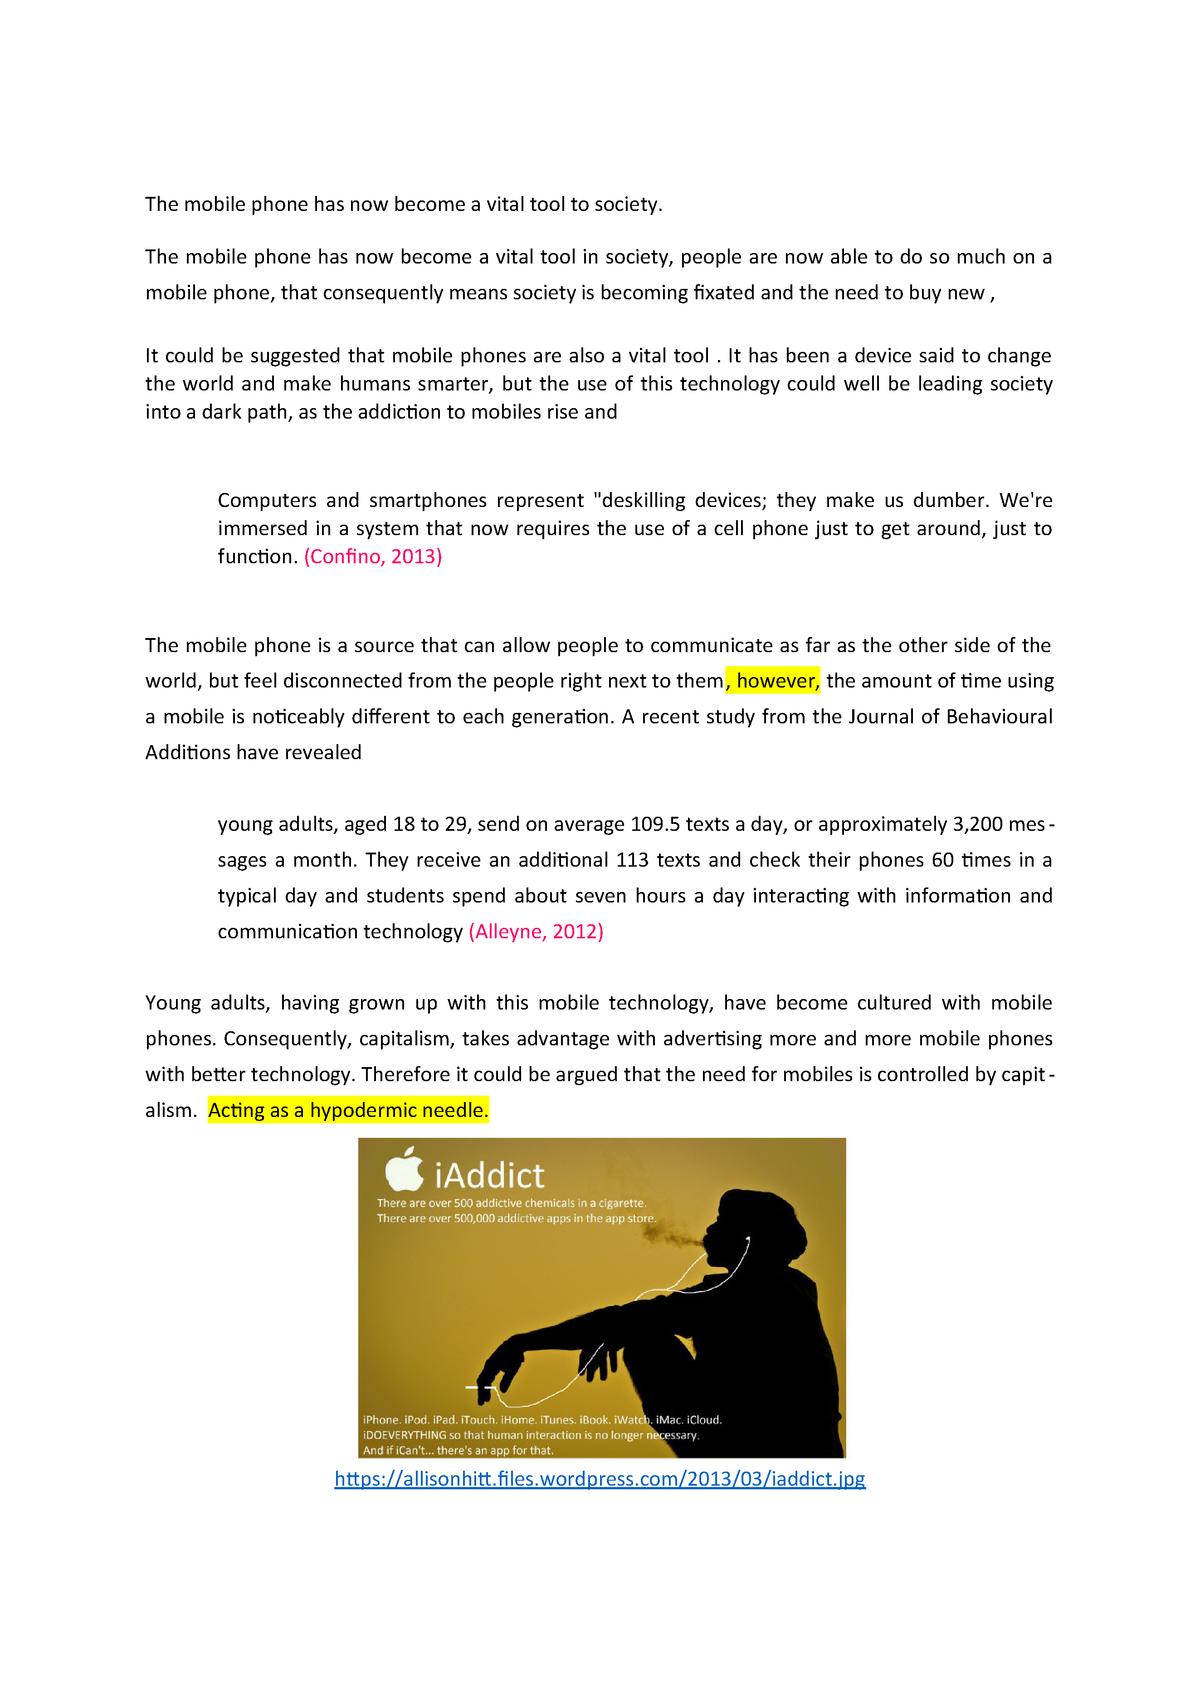 Mobile Phones Draft - AIC2103: Media Sociology and Media